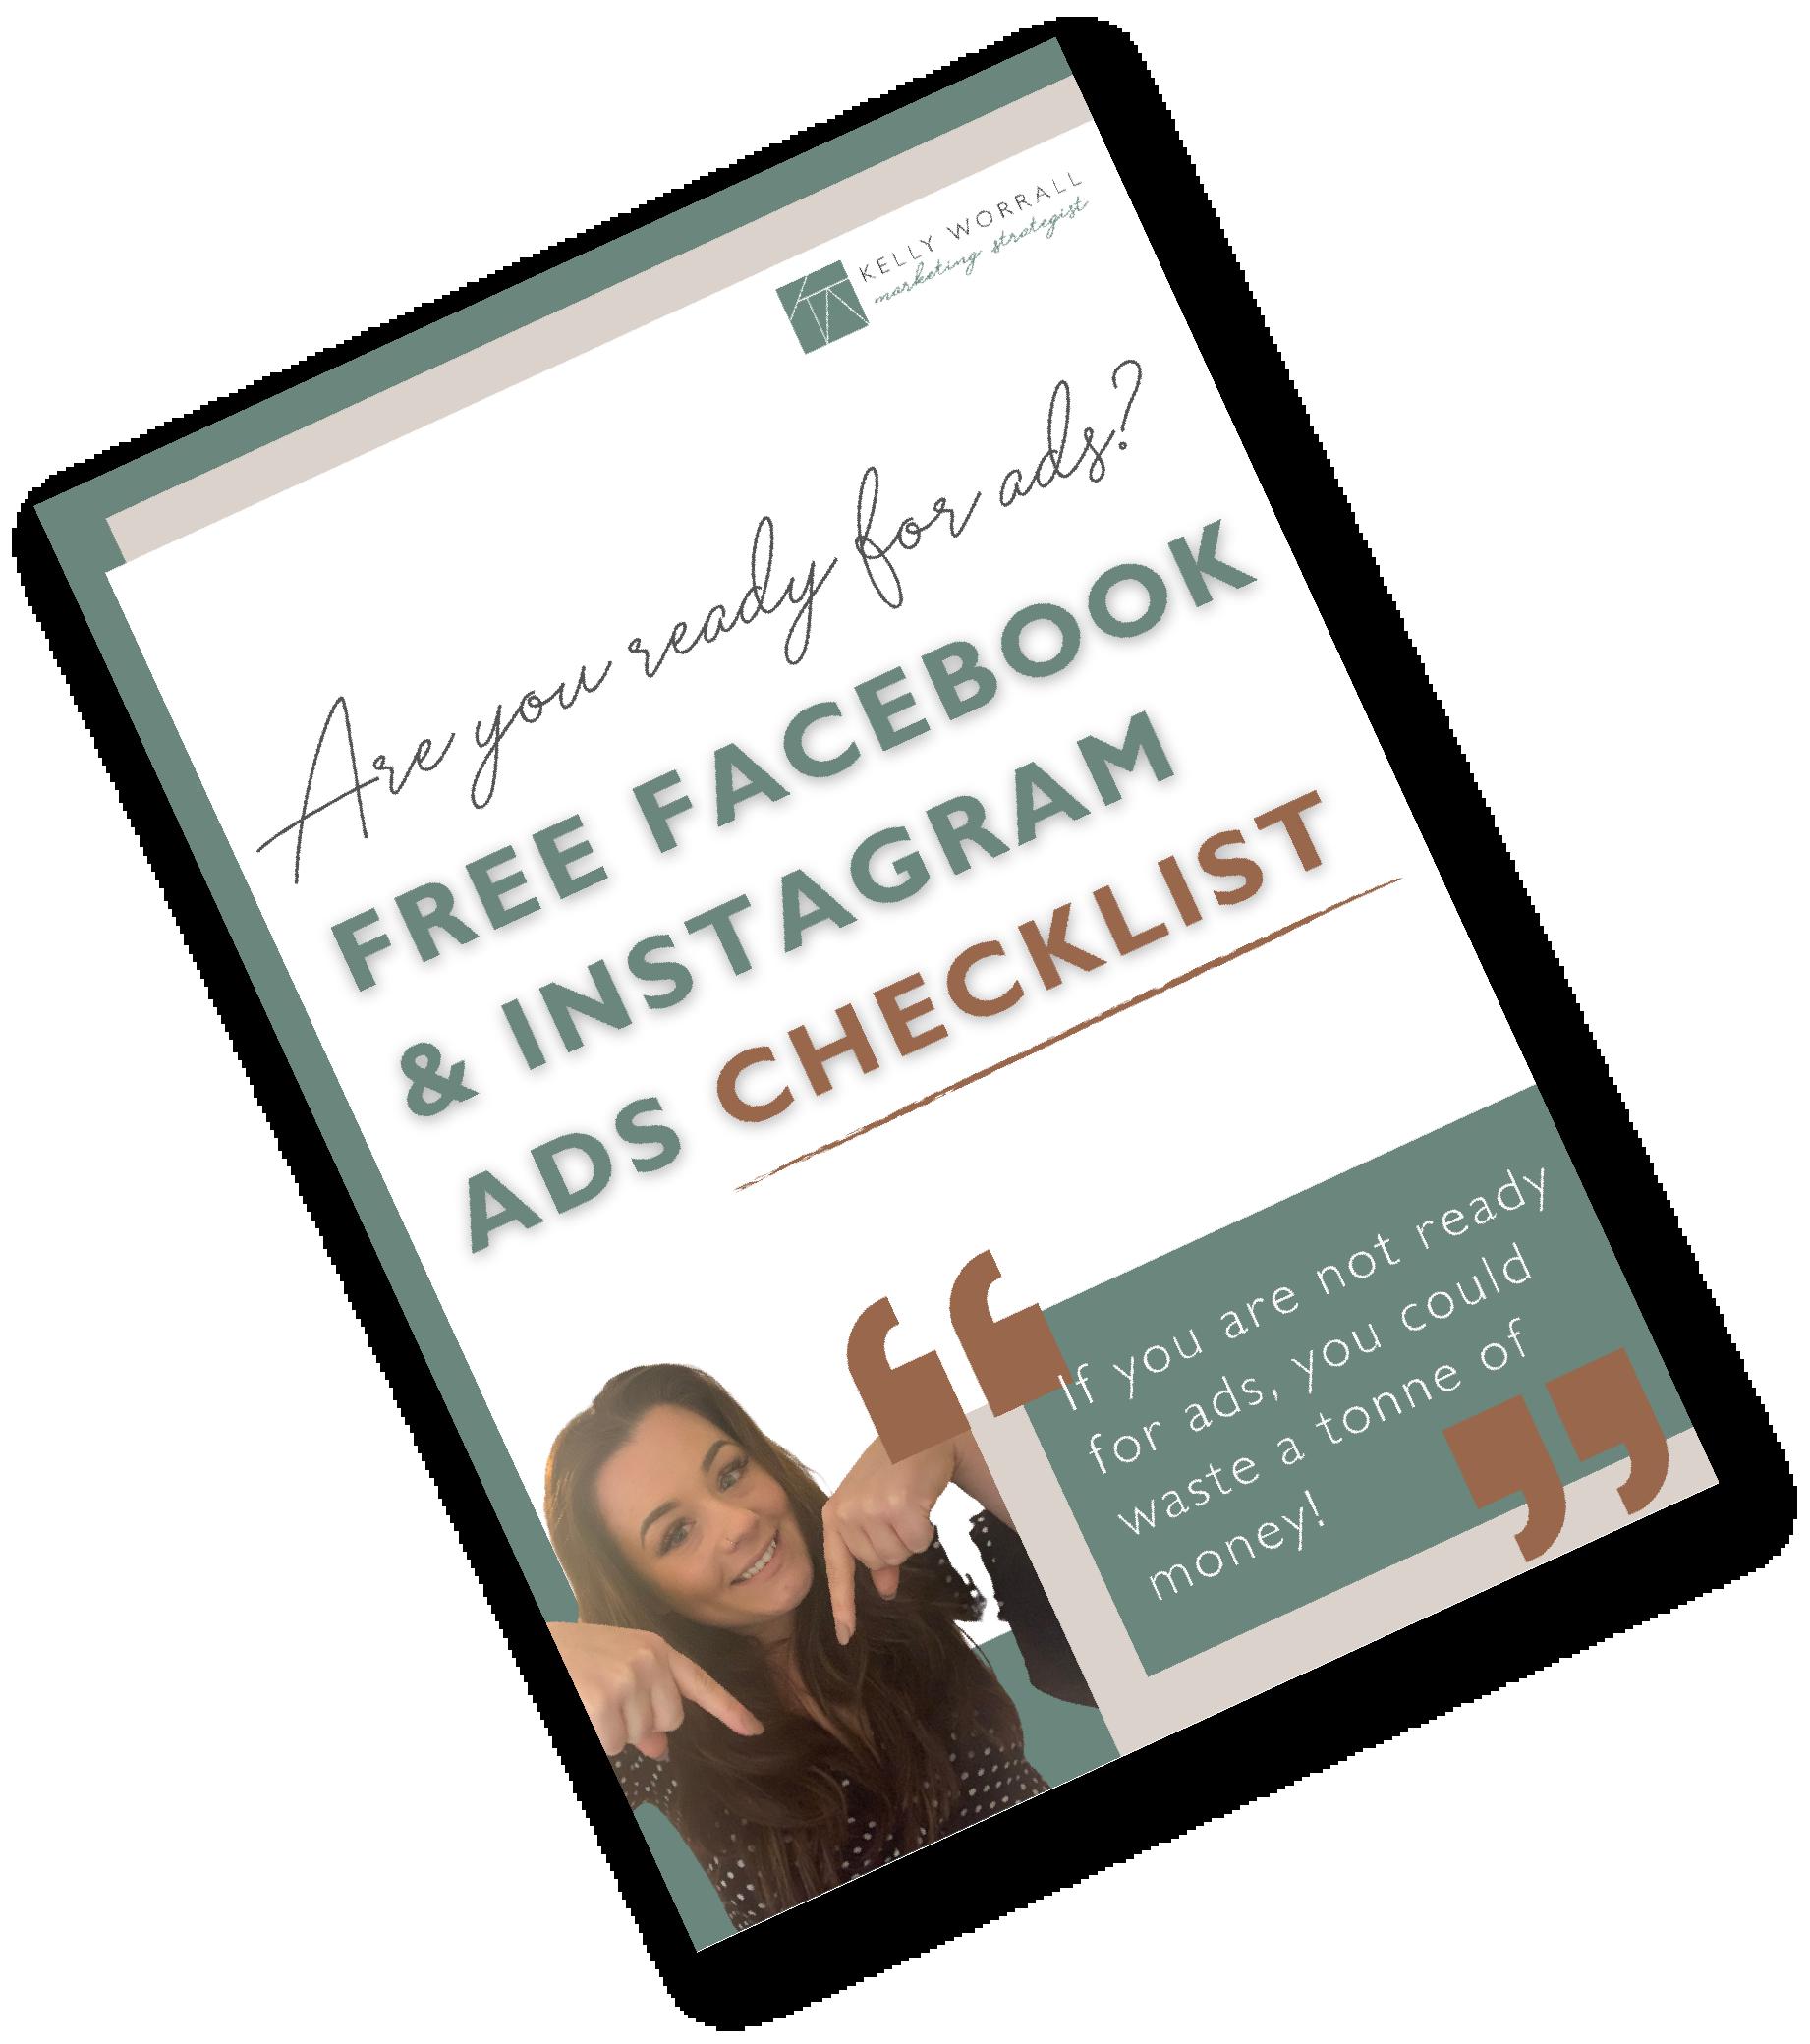 Free Facebook And Instagram Checklist